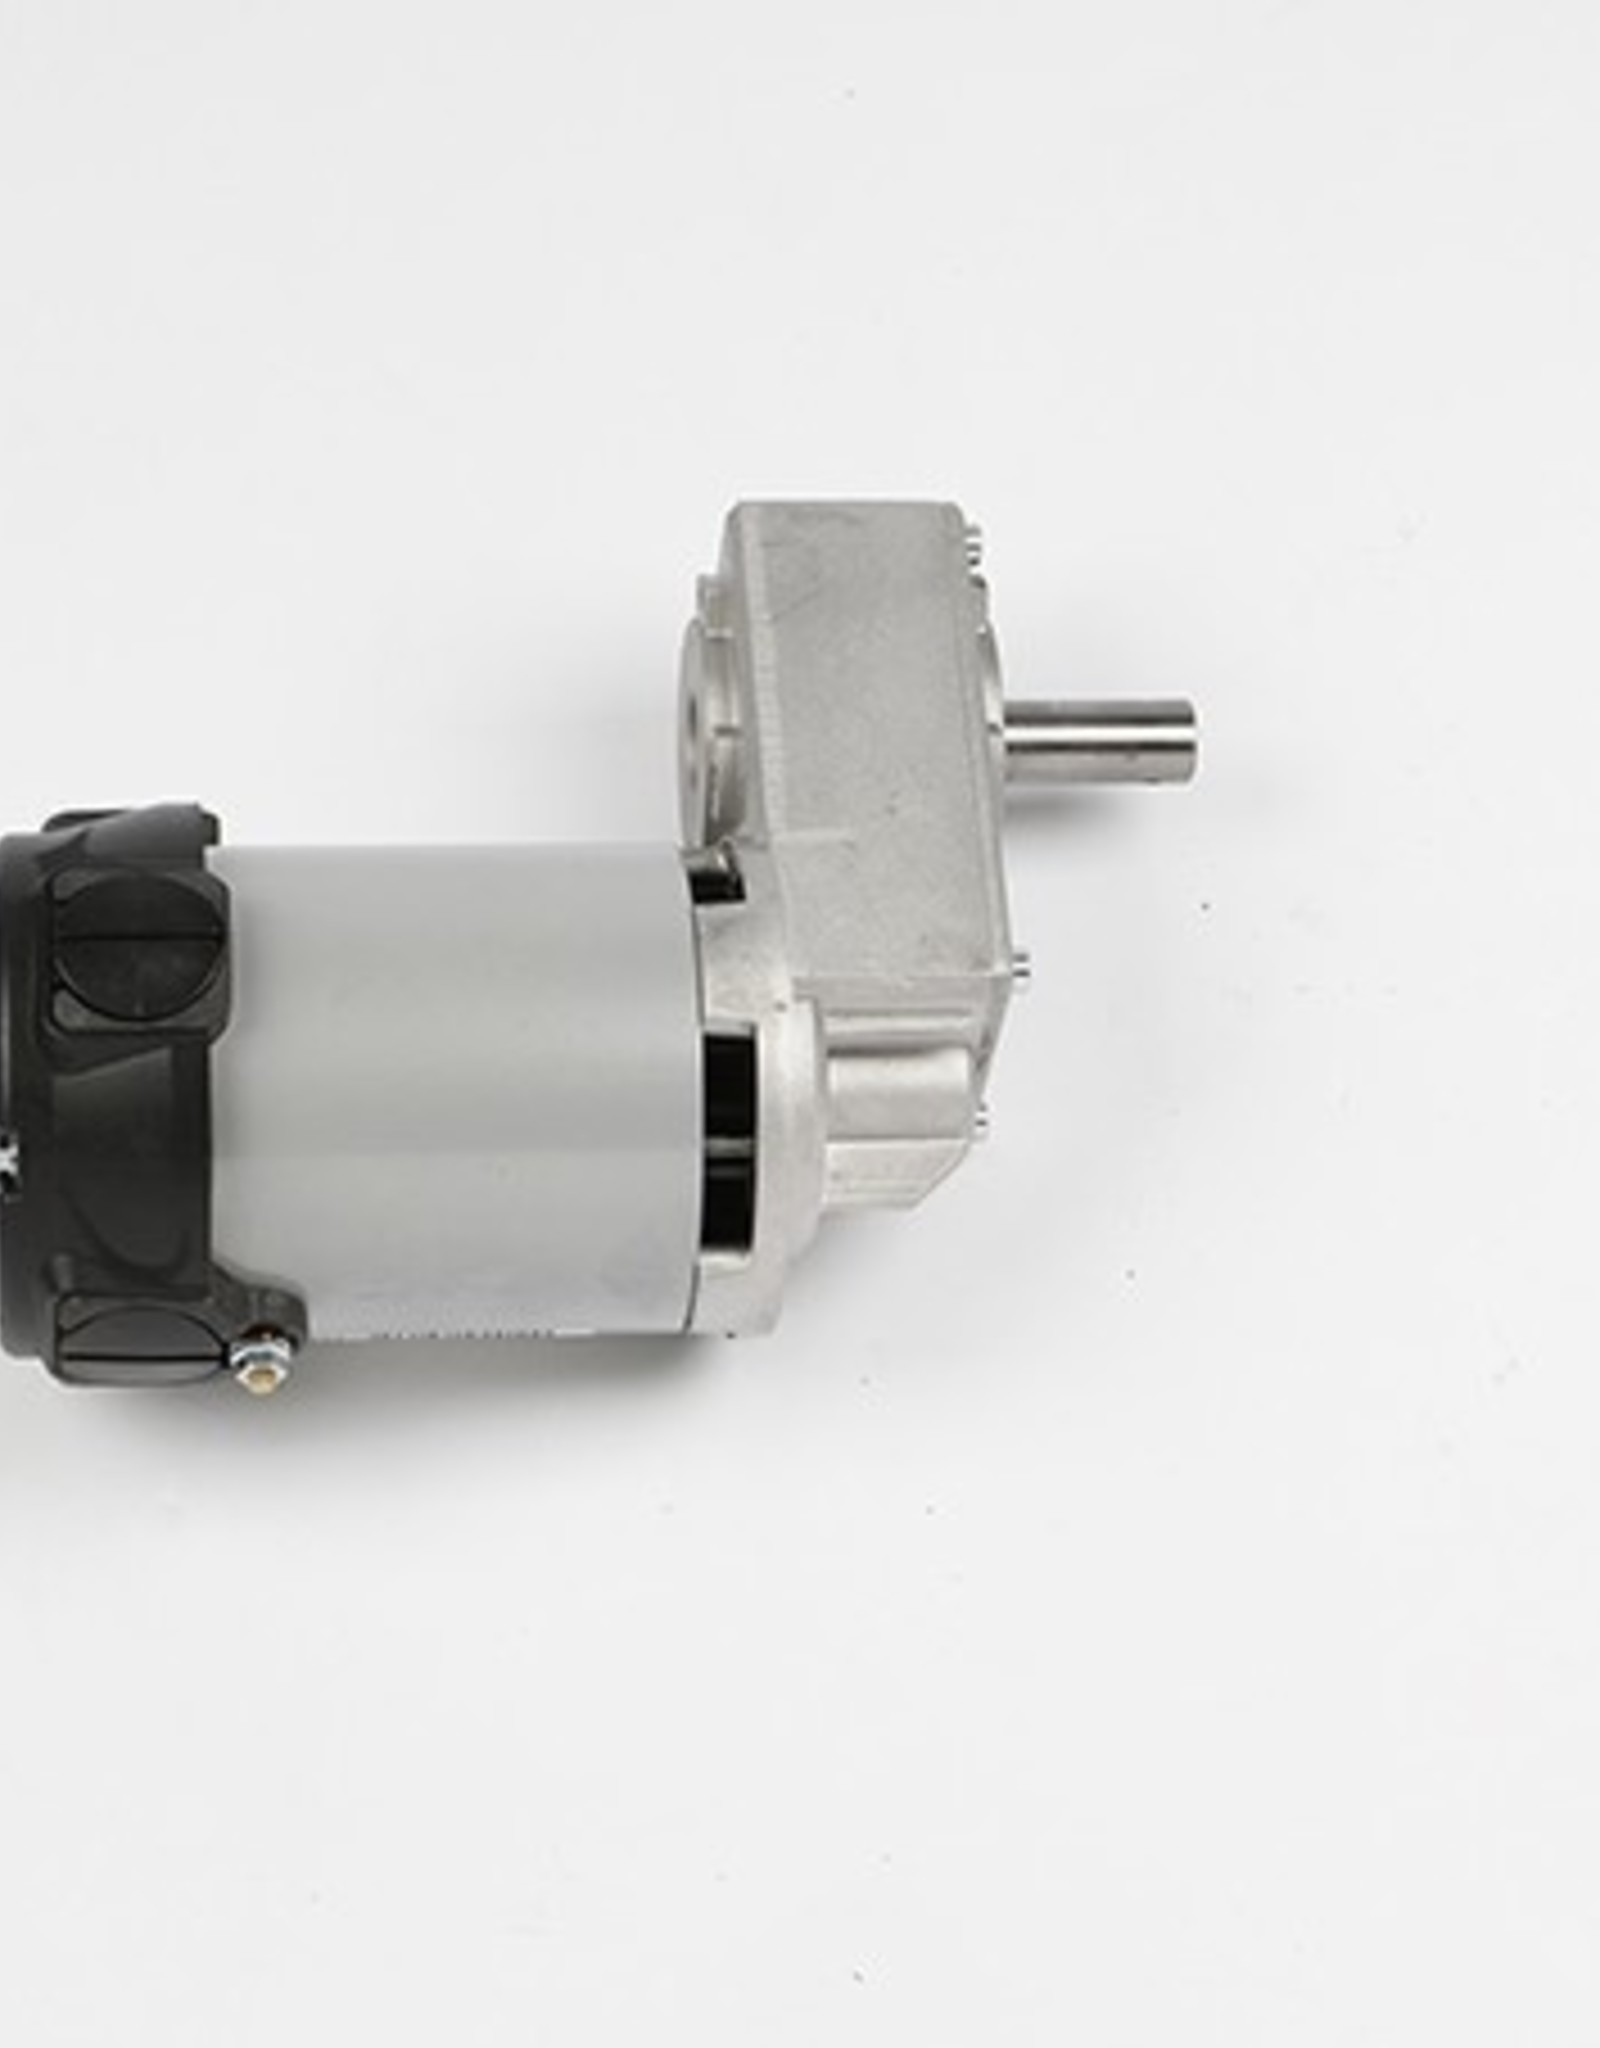 NUMATIC Amer Borstel Motor 24 Volt (24V-330W-100tpm-15Amp)